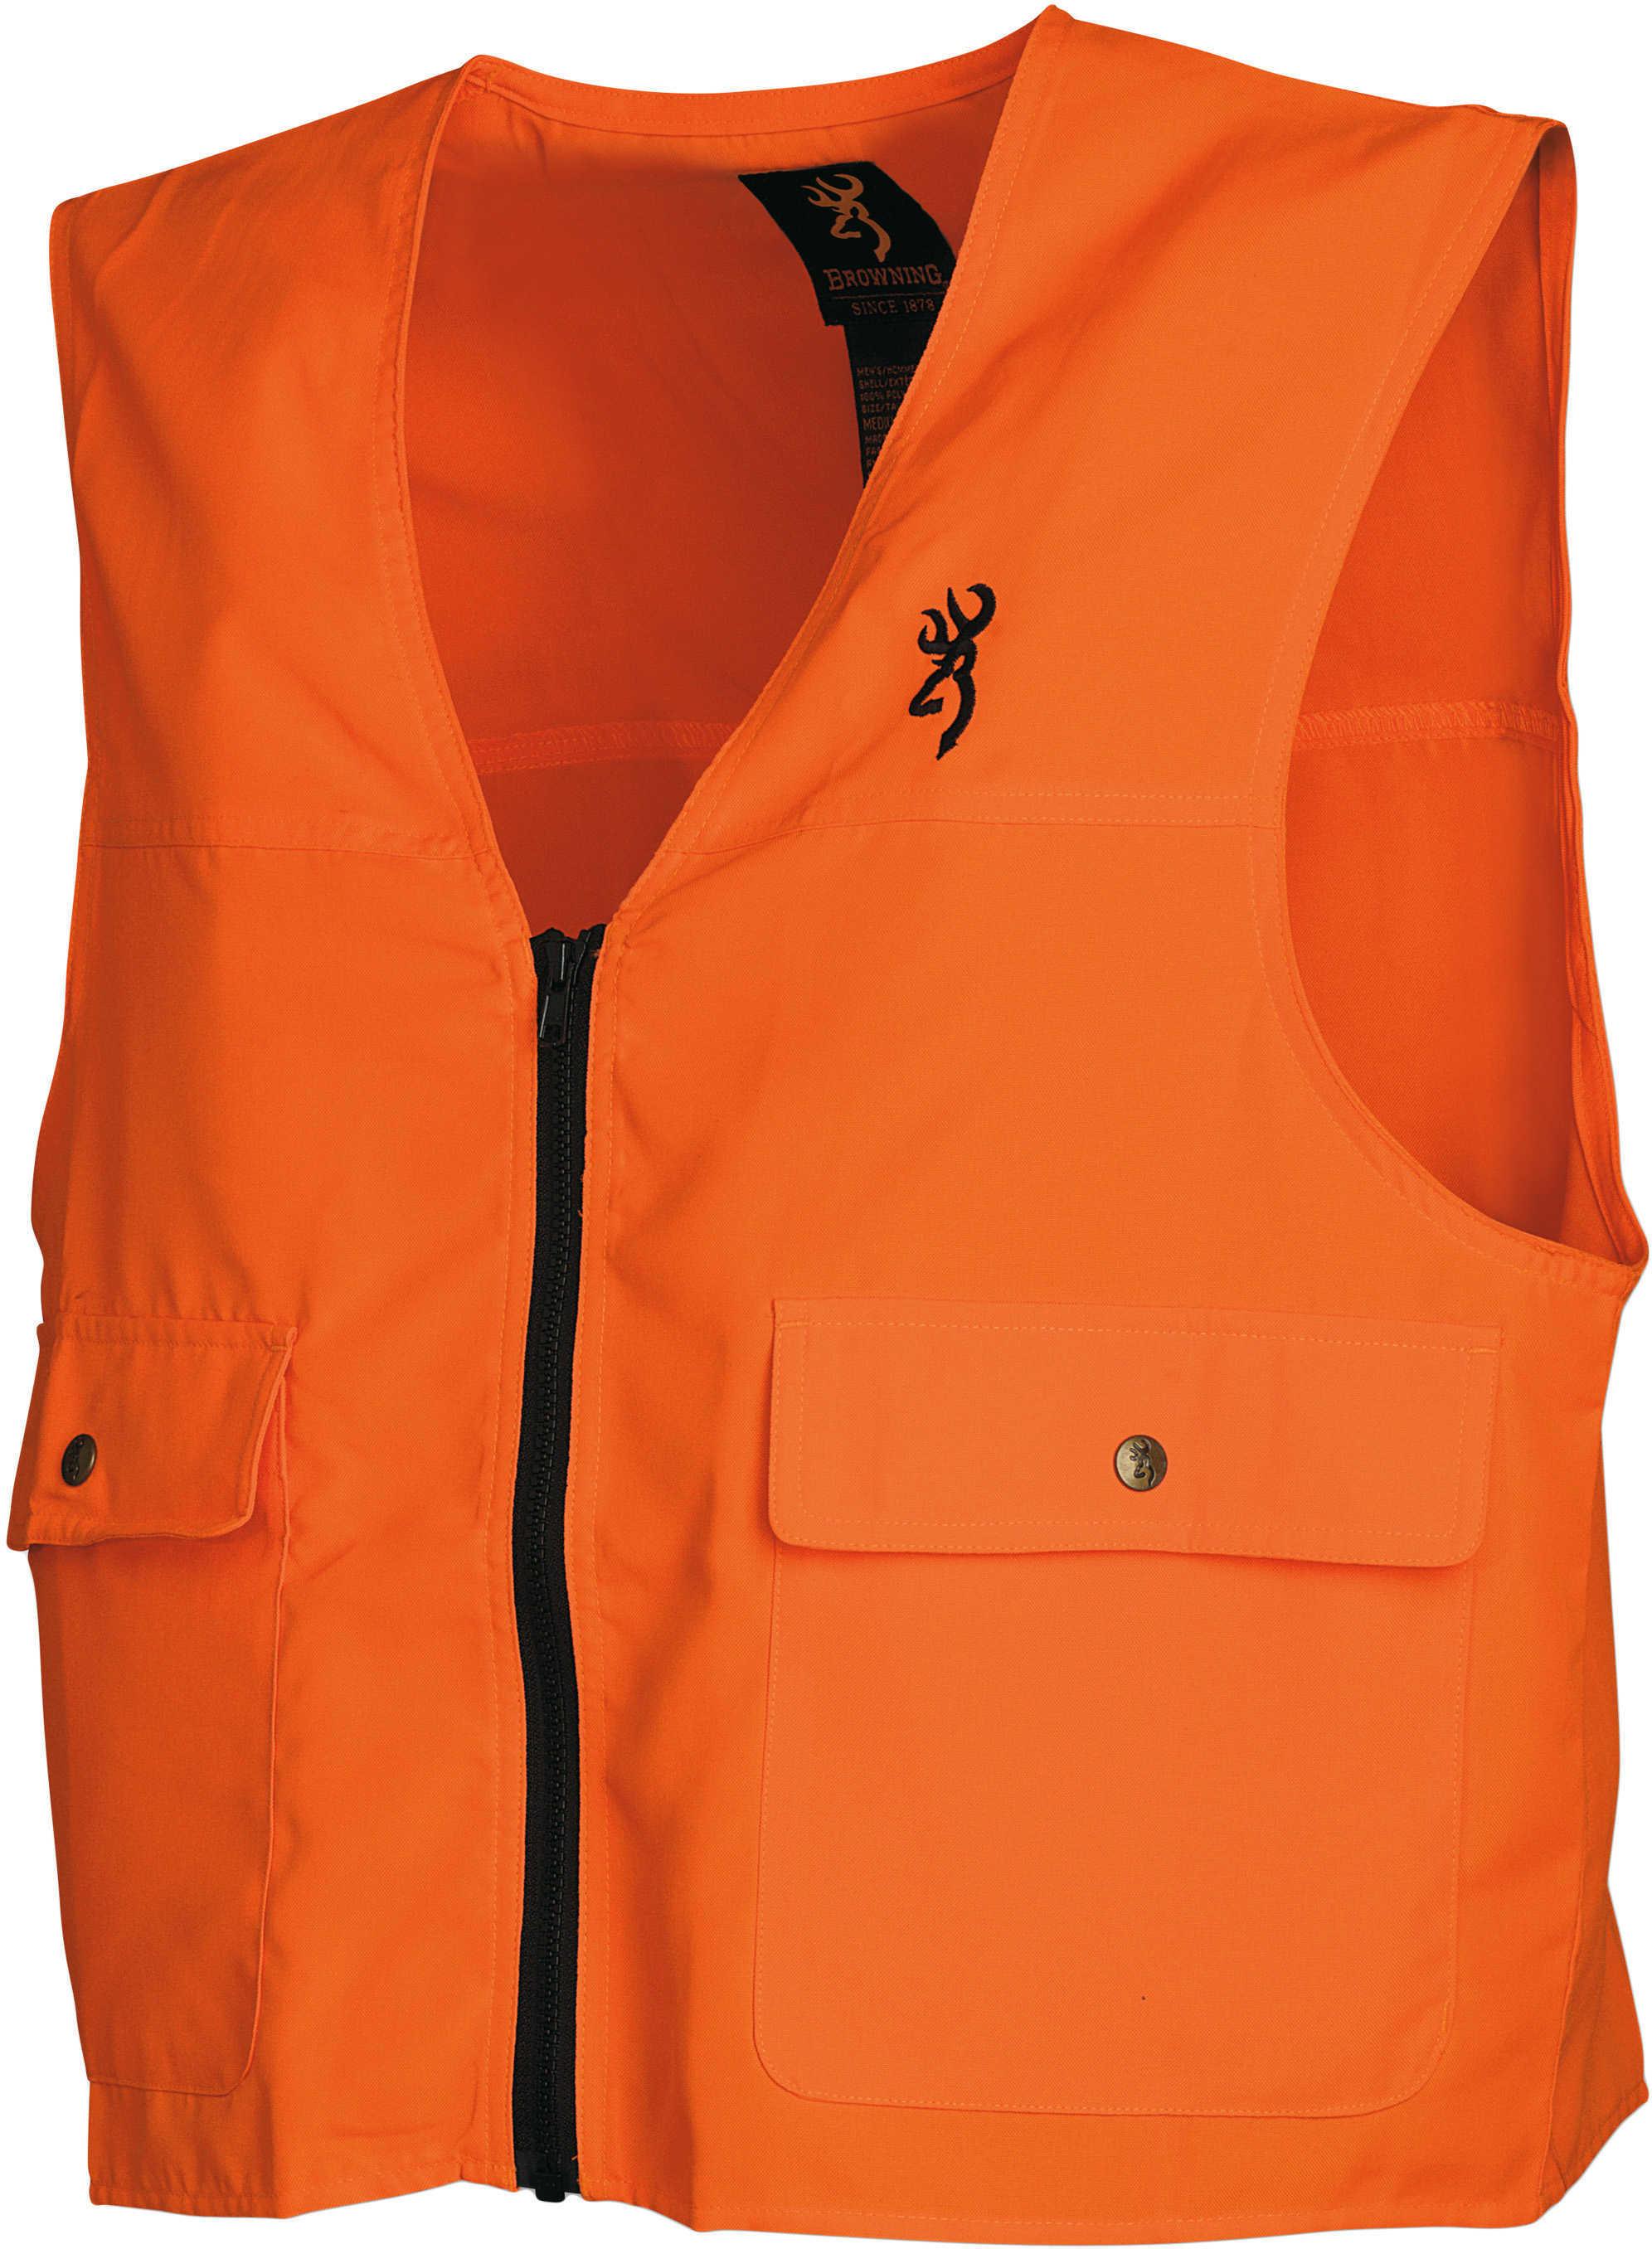 BG Safety Vest Buck Mark Logo Blaze Orange Xx-Large